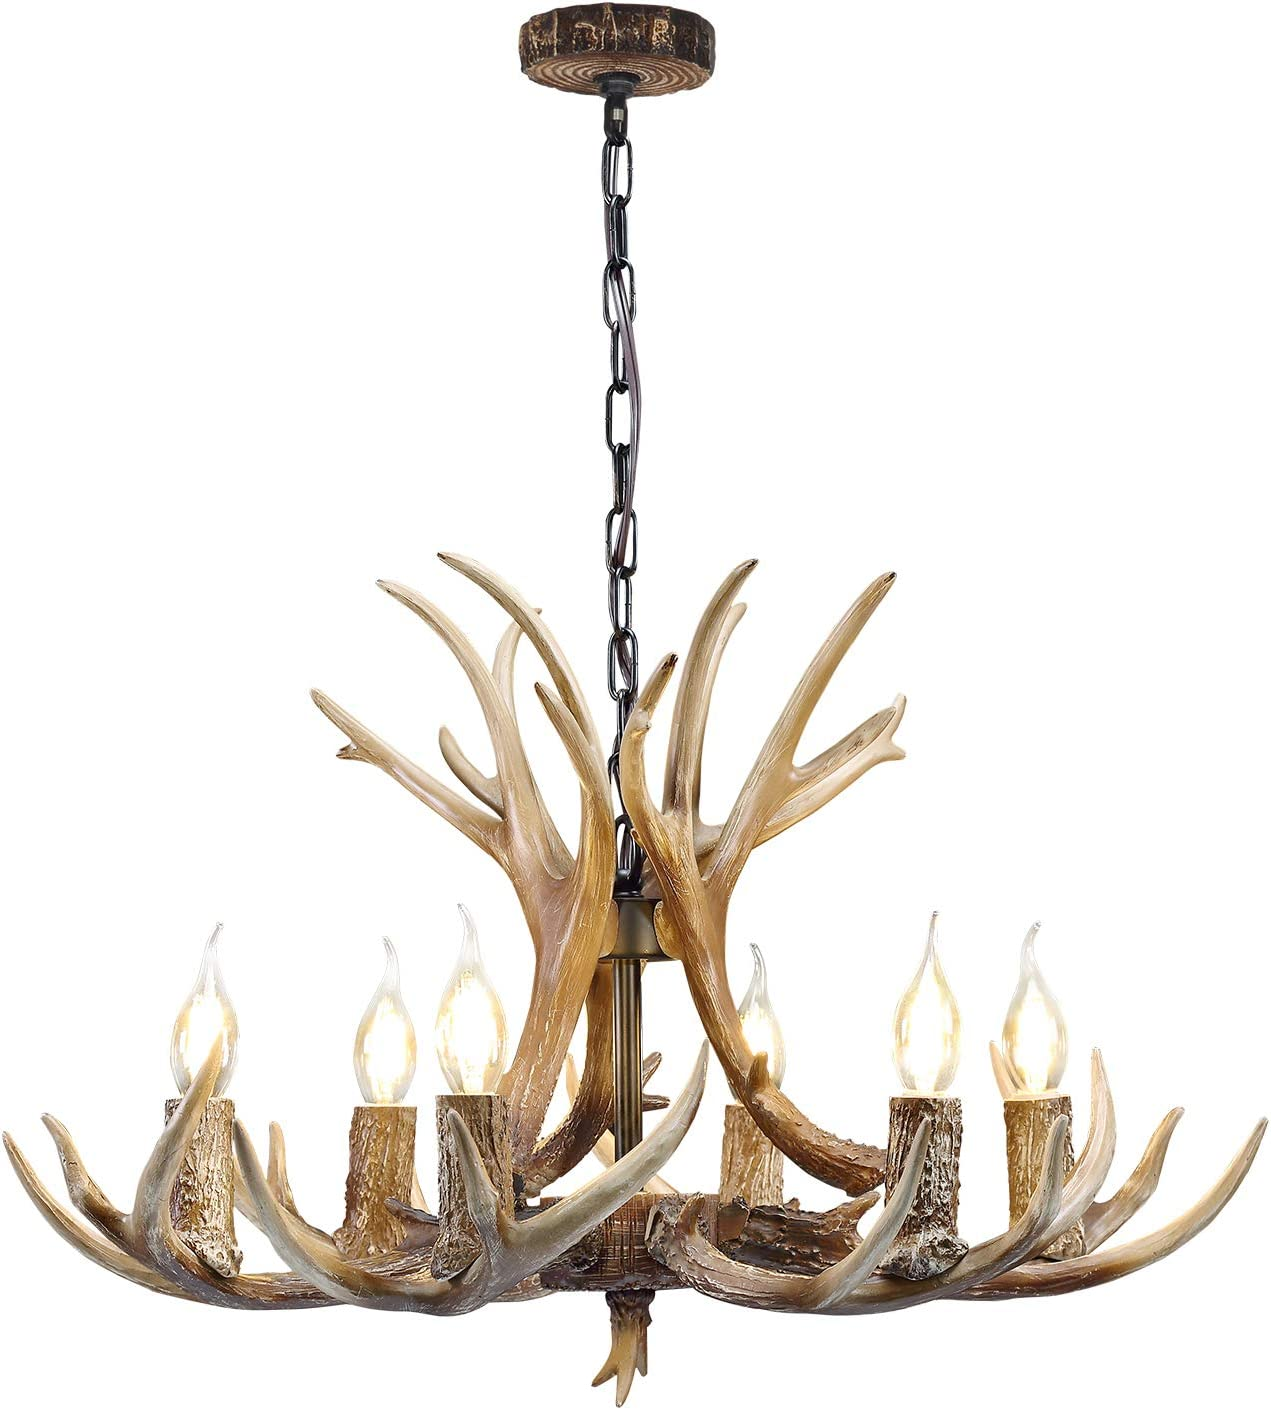 Rustic Antler Chandelier Lighting, 6 Light Resin Deer Antler Chandelier Vintage Style for Living Room Dining Room Bedroom Bar Cafe American Retro Deer Horn Ceiling Light